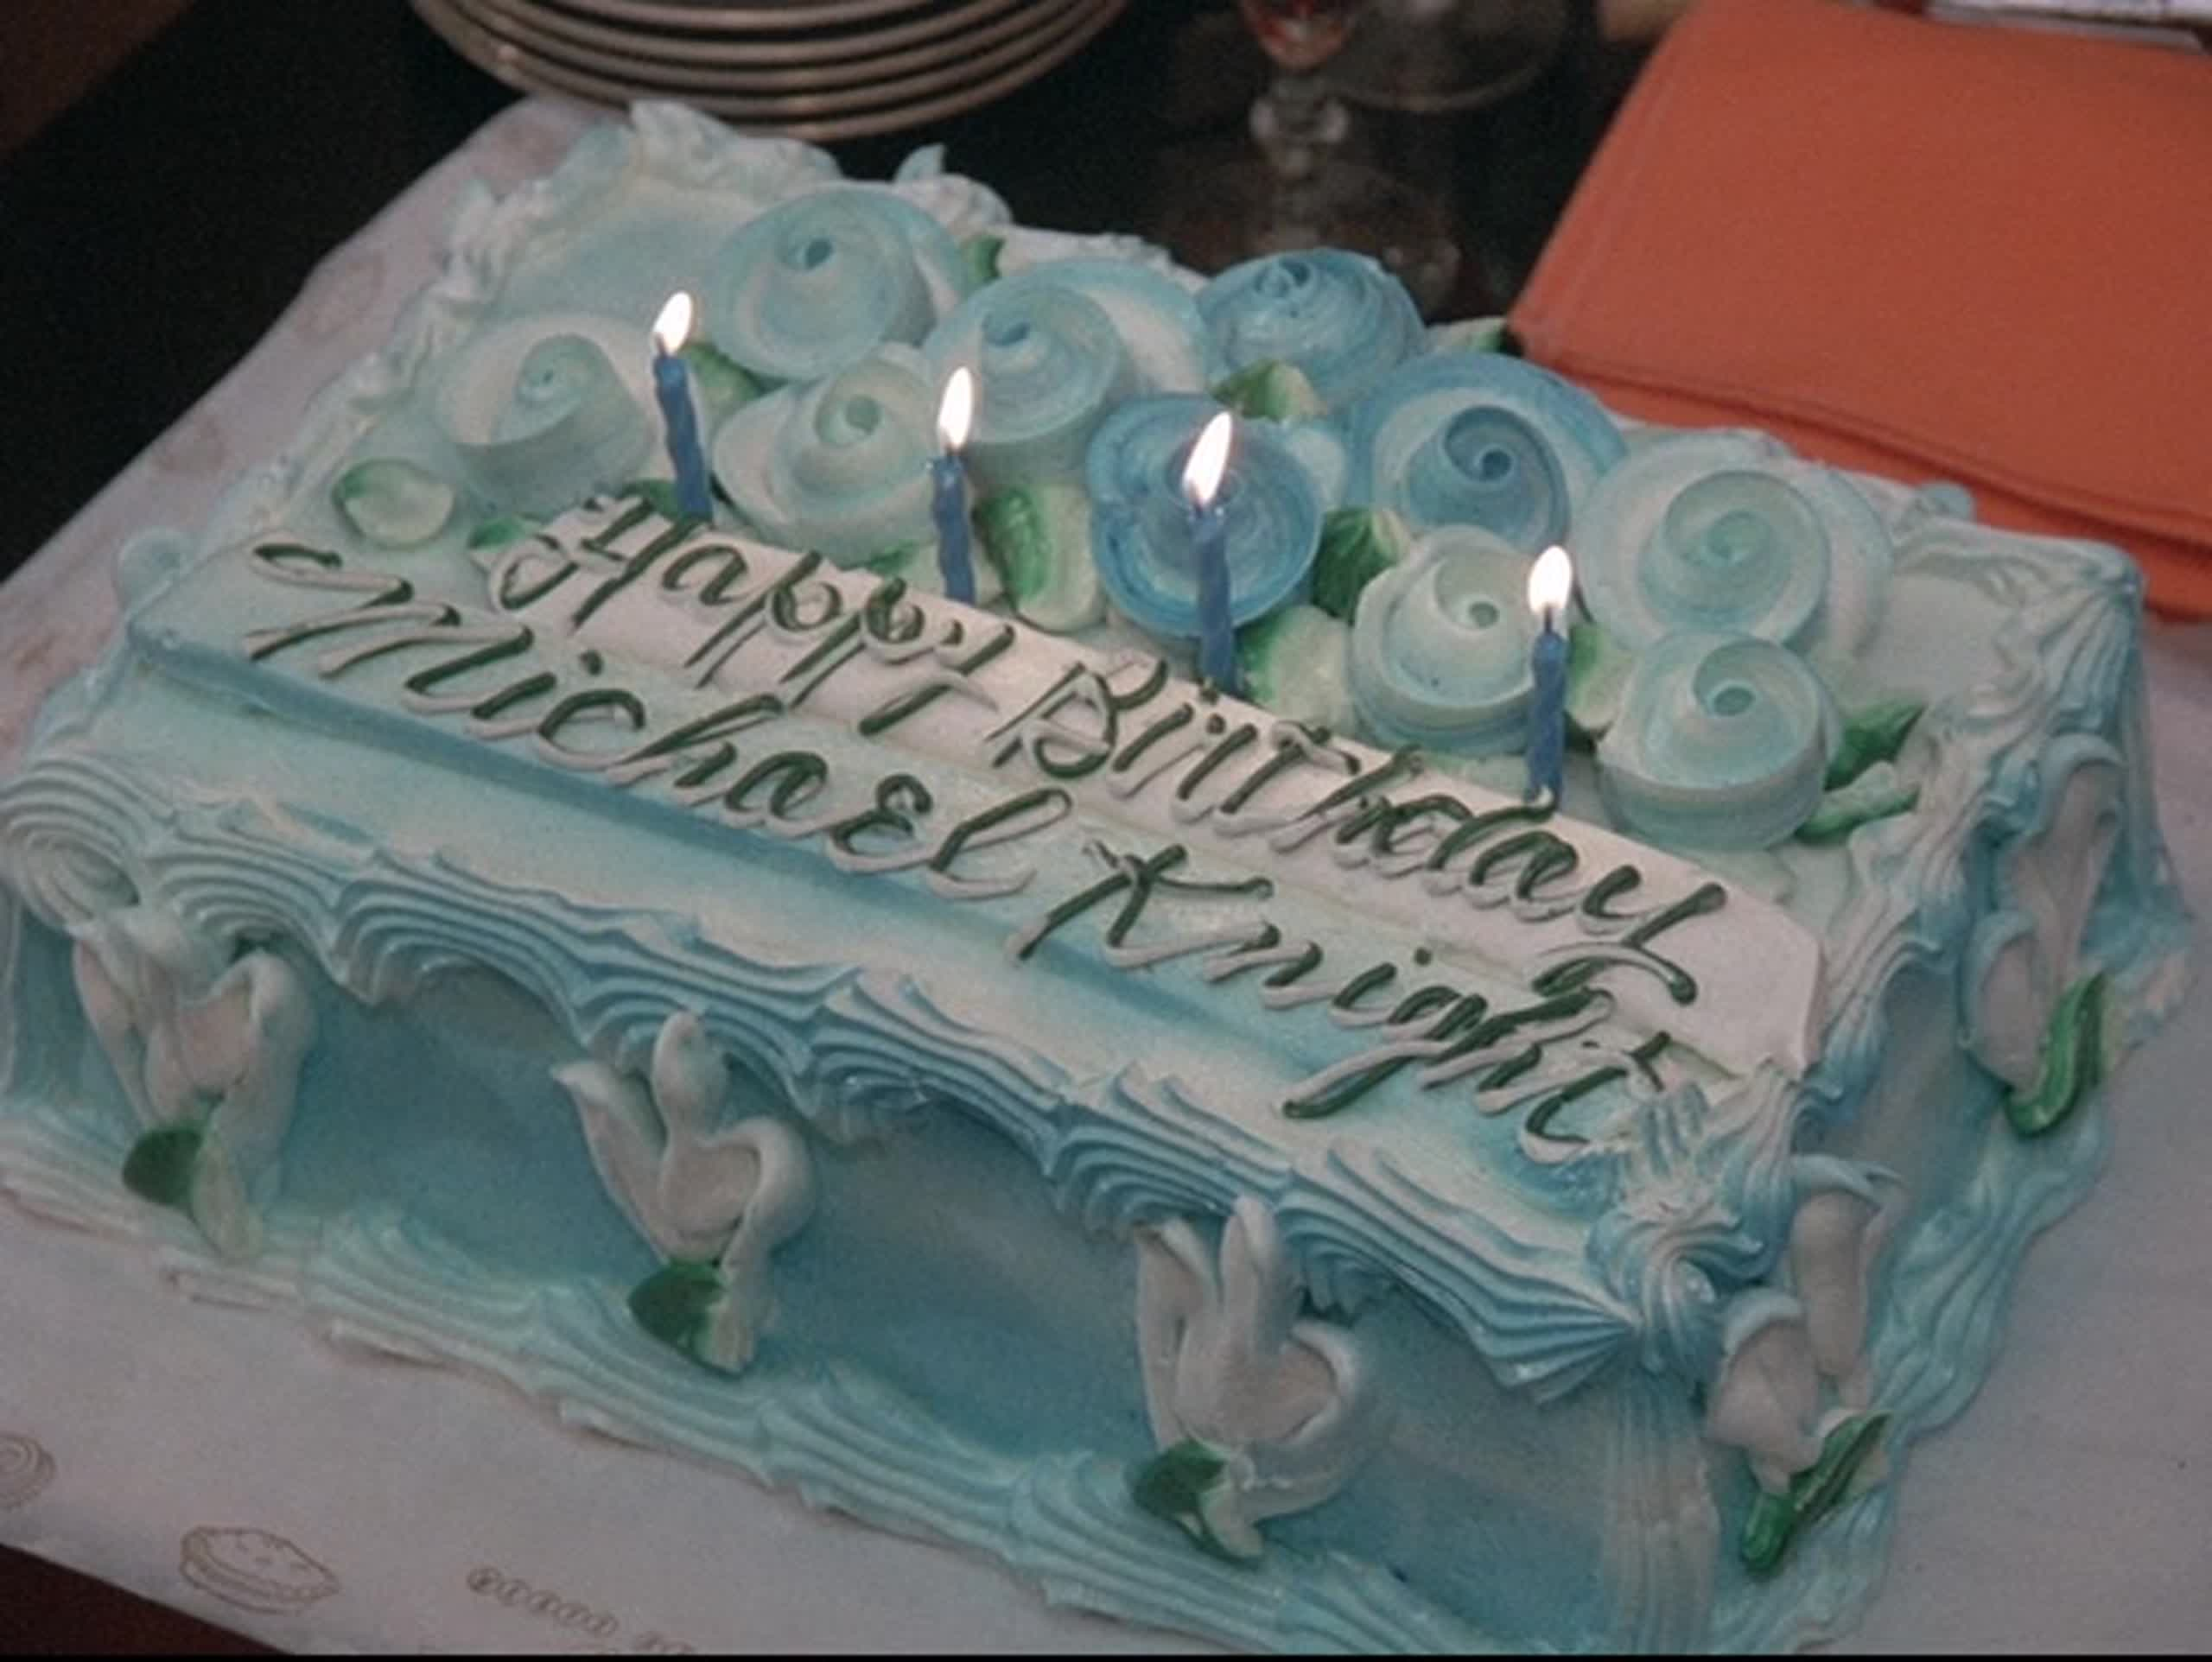 Happy Birthday David Hasselhoff Knight Rider Archives News